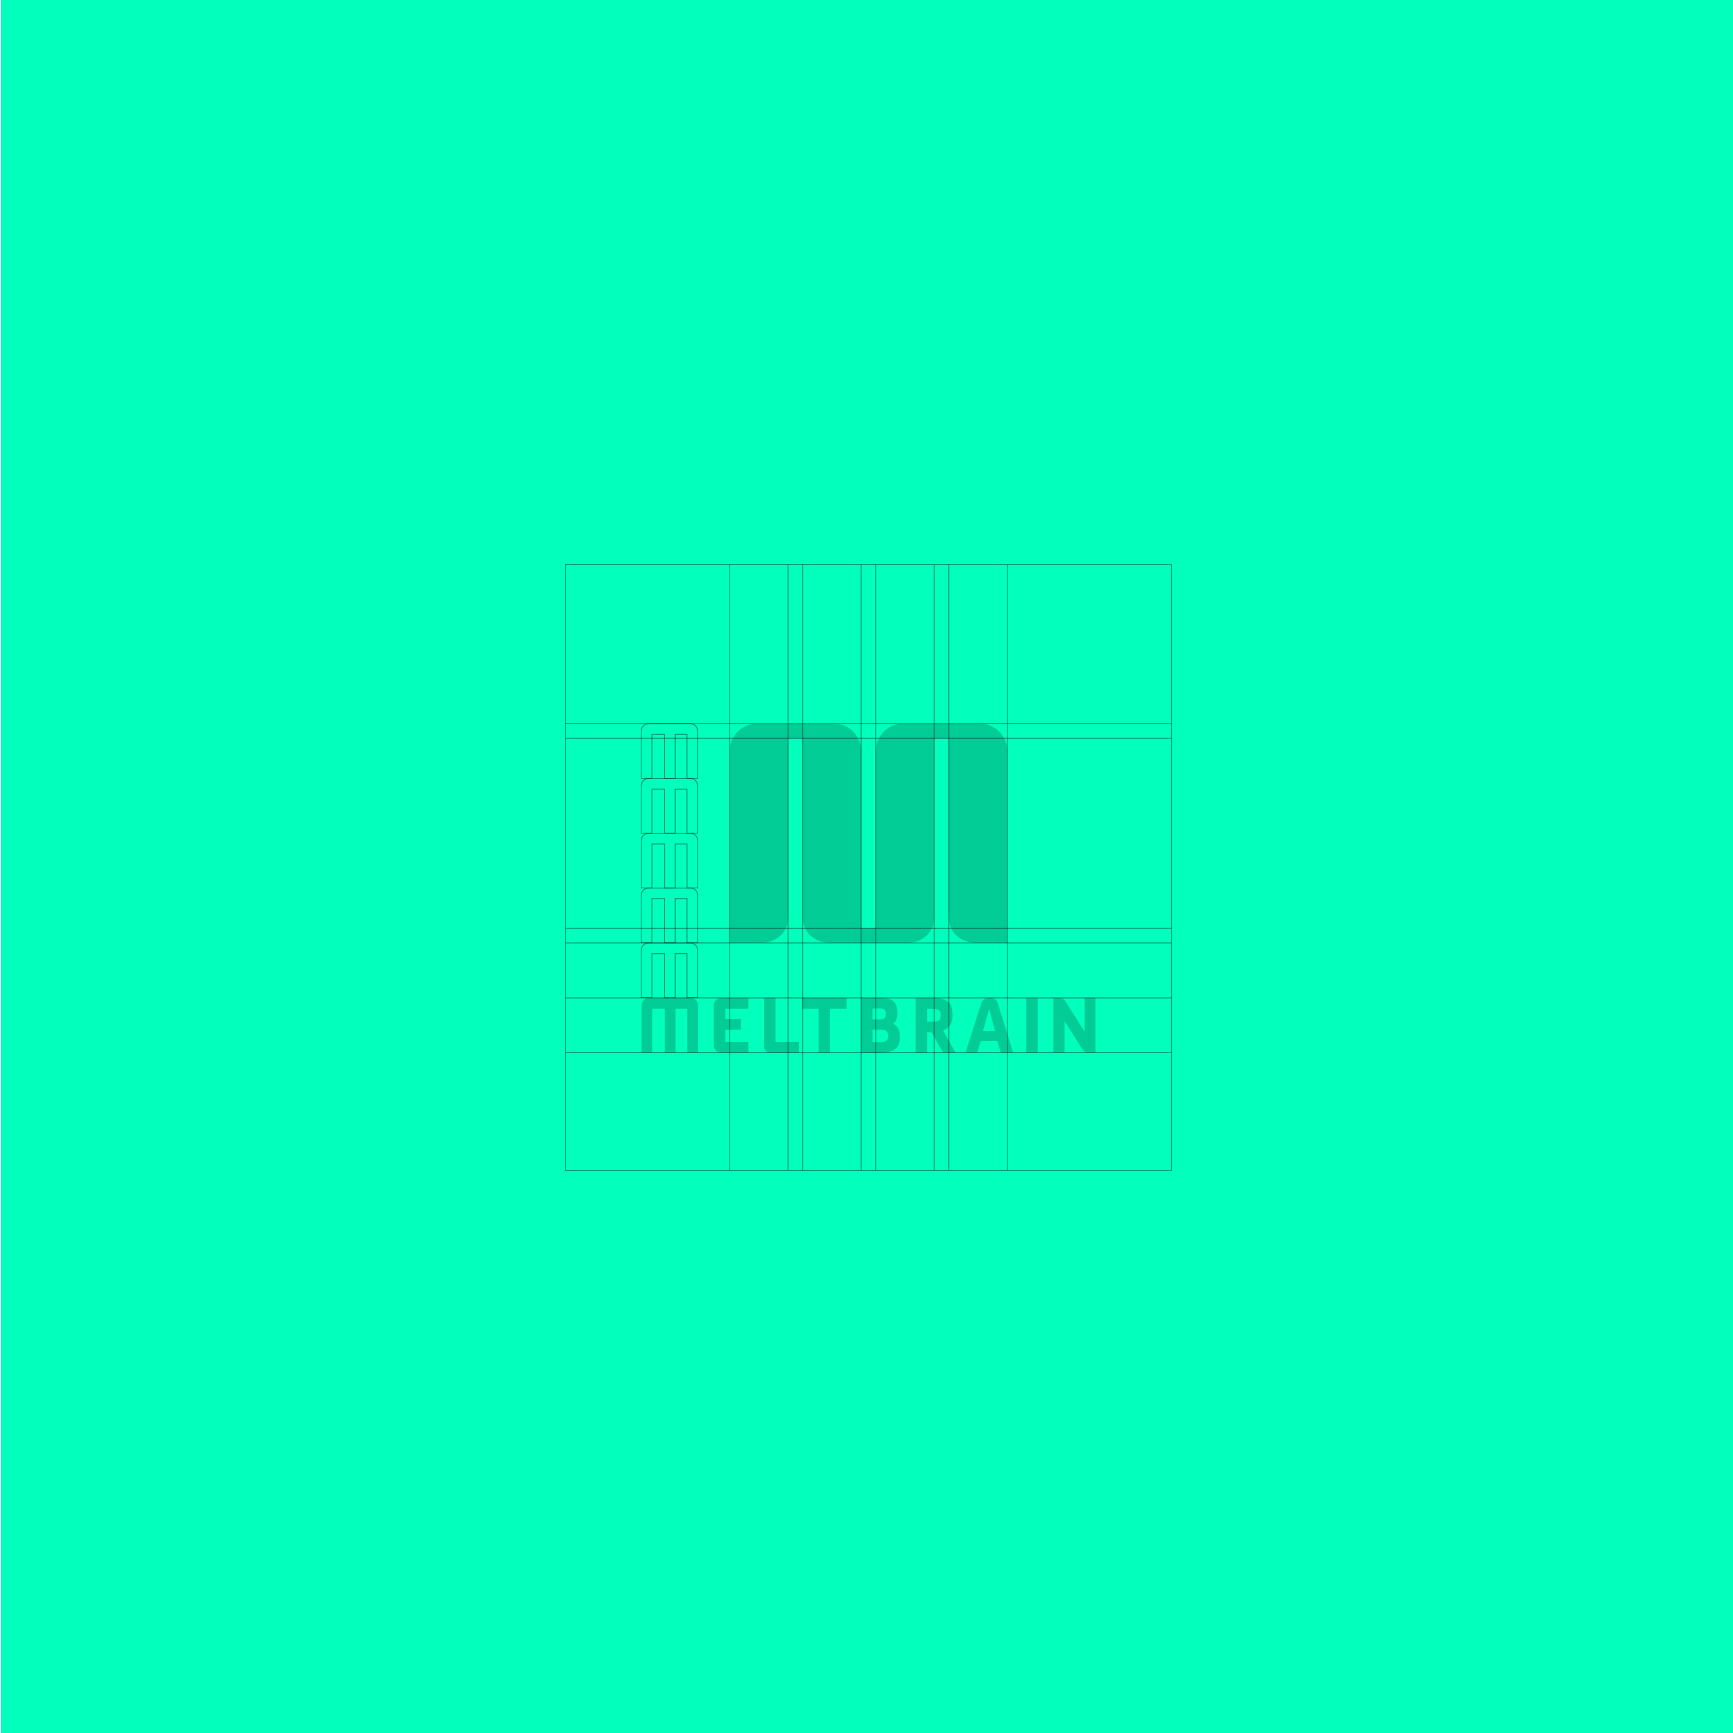 Melt-Brain_logo-Build_Studio-St-Louis